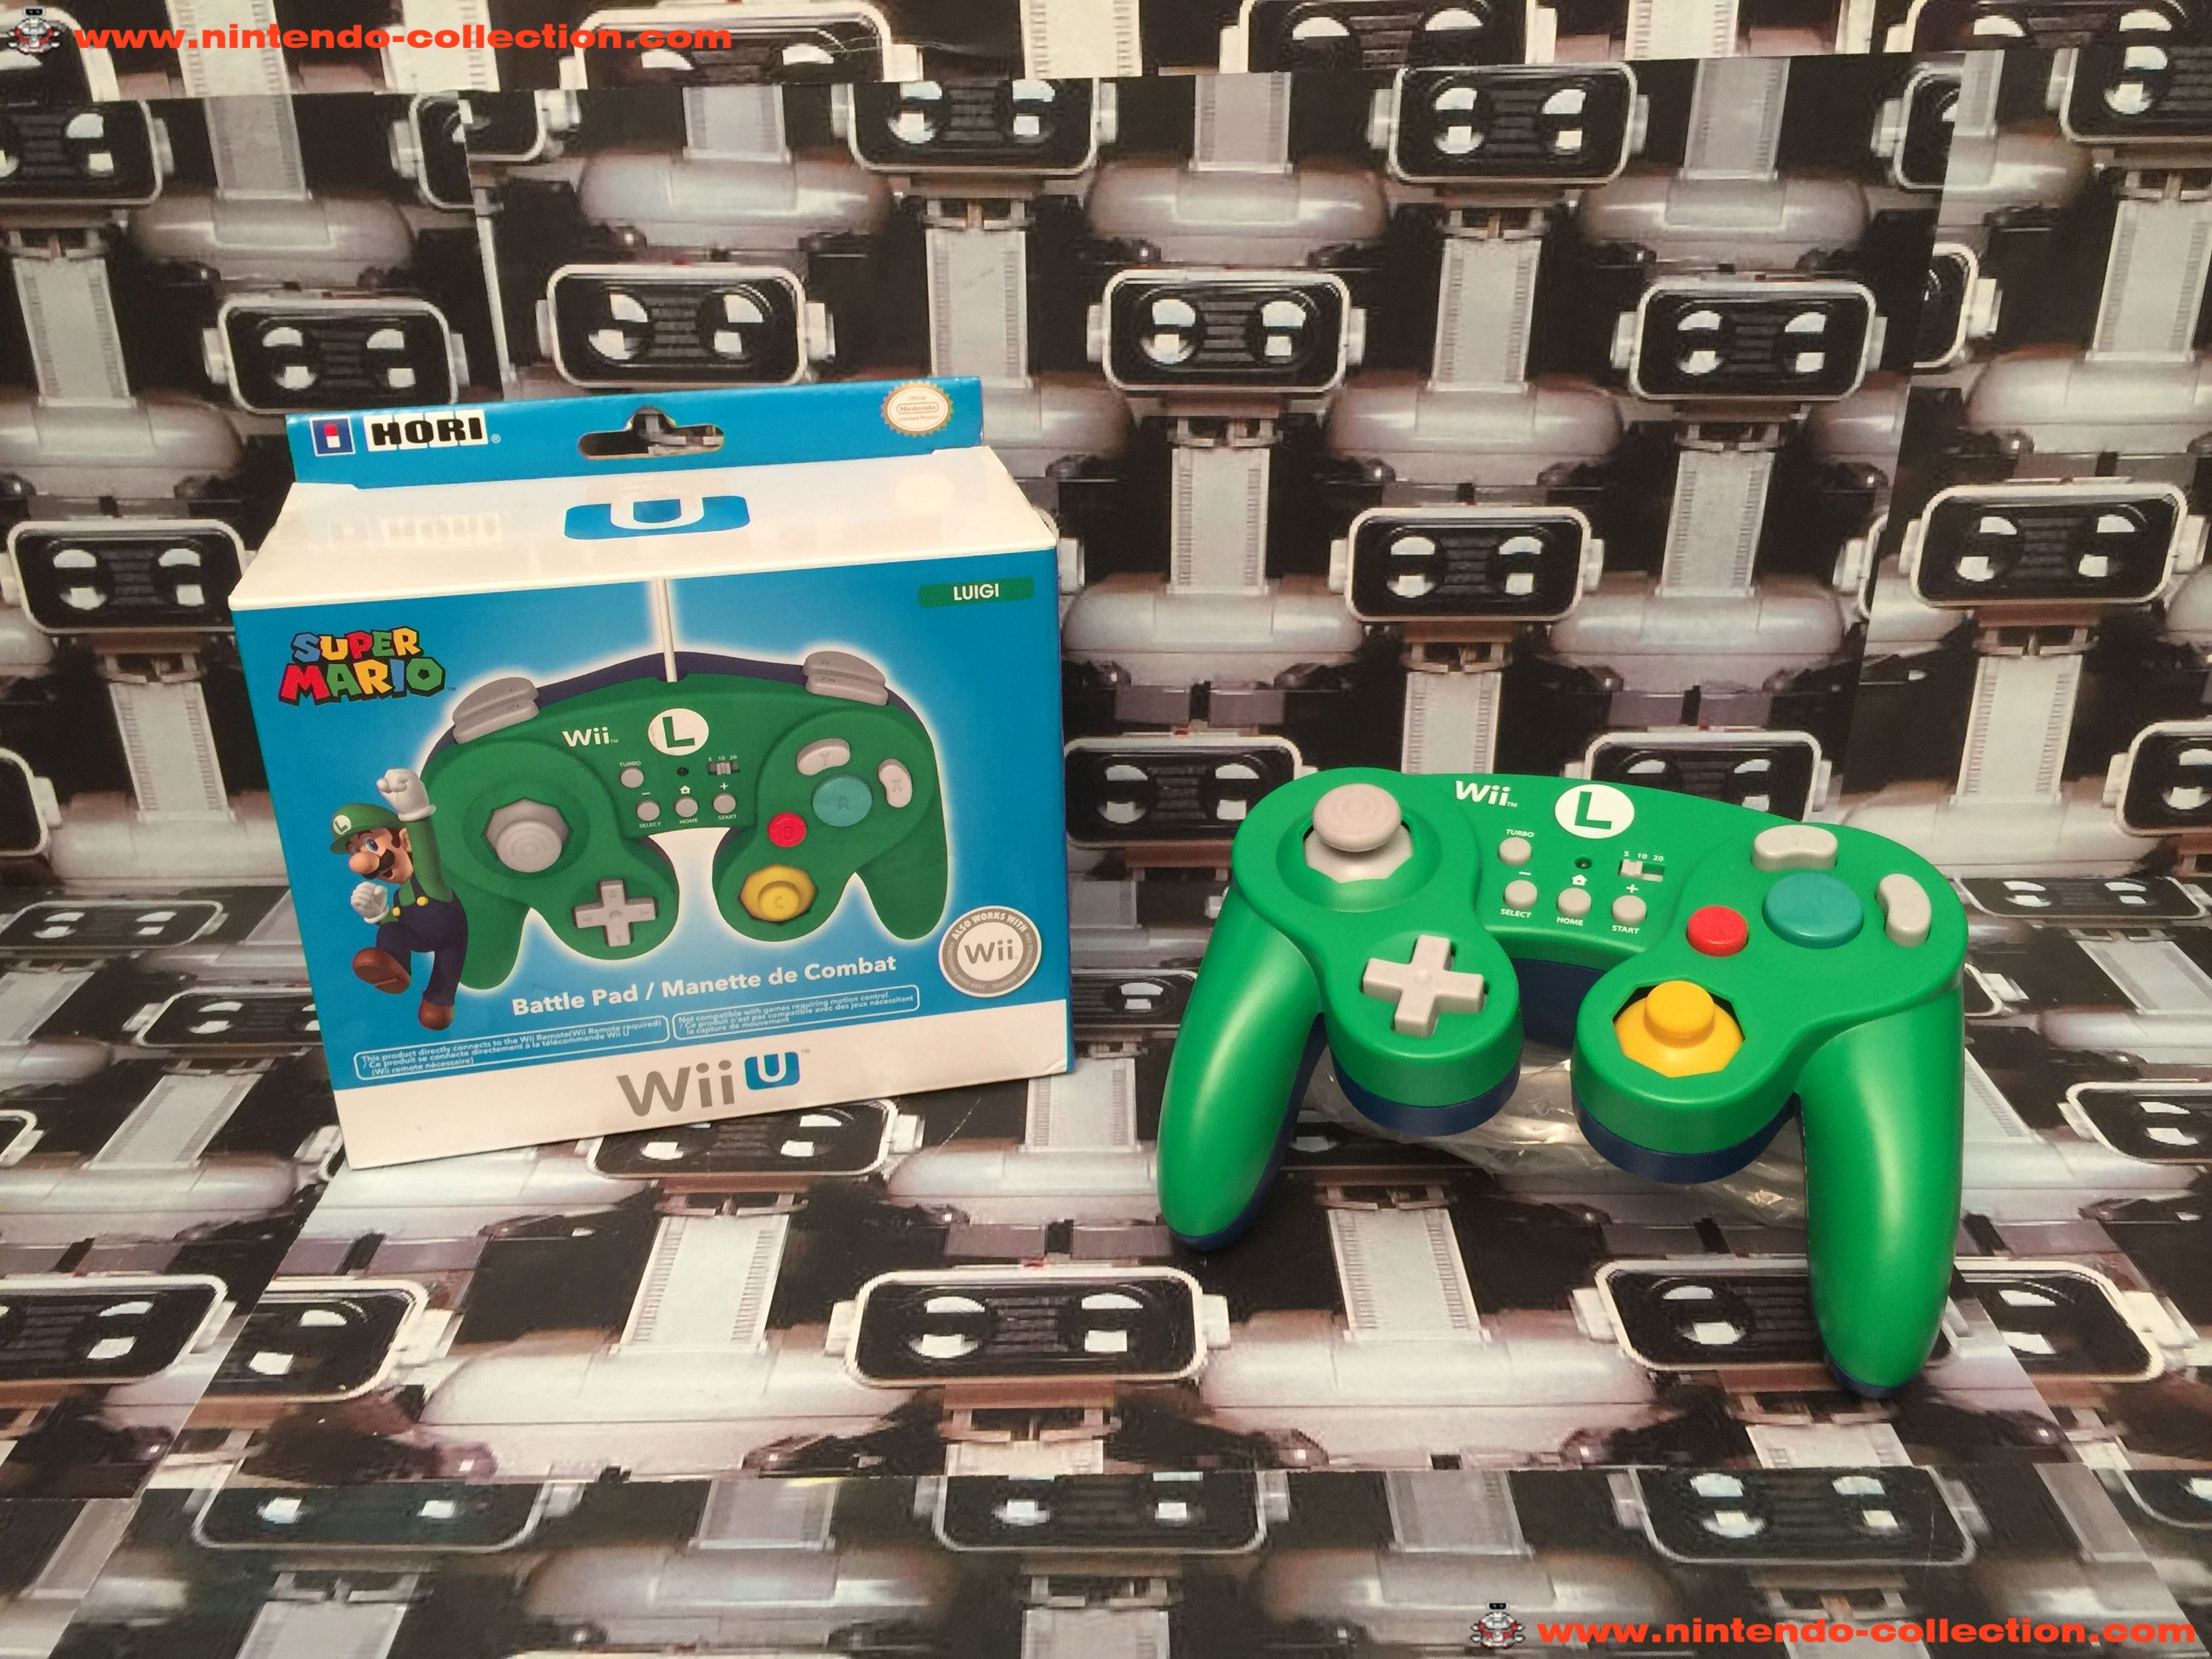 www.nintendo-collection.com - Nintendo Wii U Accessory Accessoire Hori Gamecube Bttle Pad Luigi Cont